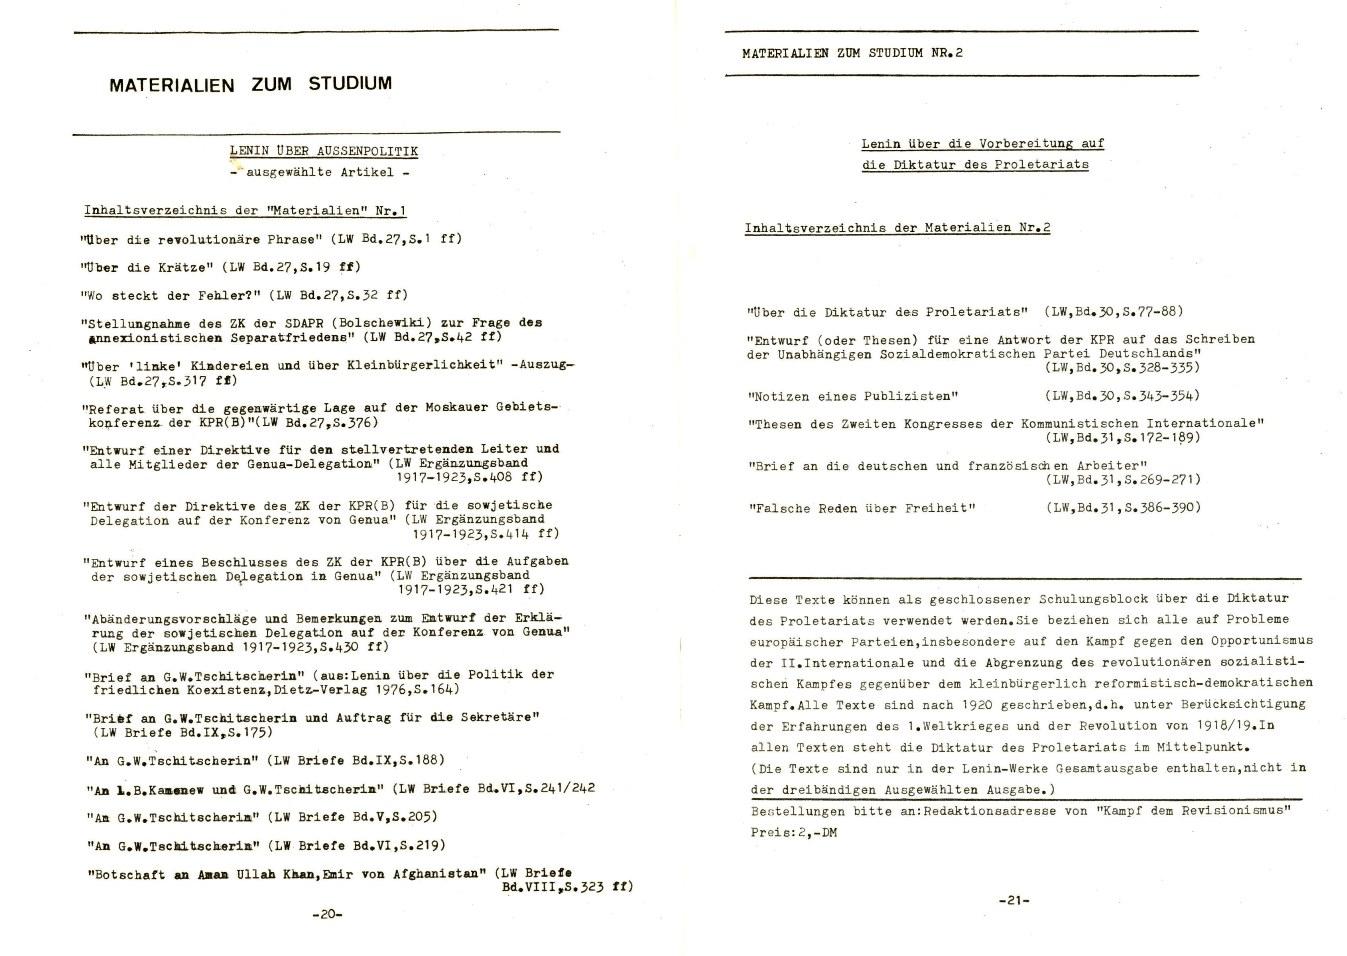 Muenchen_Kampf_dem_Revisionismus_1978_06_11